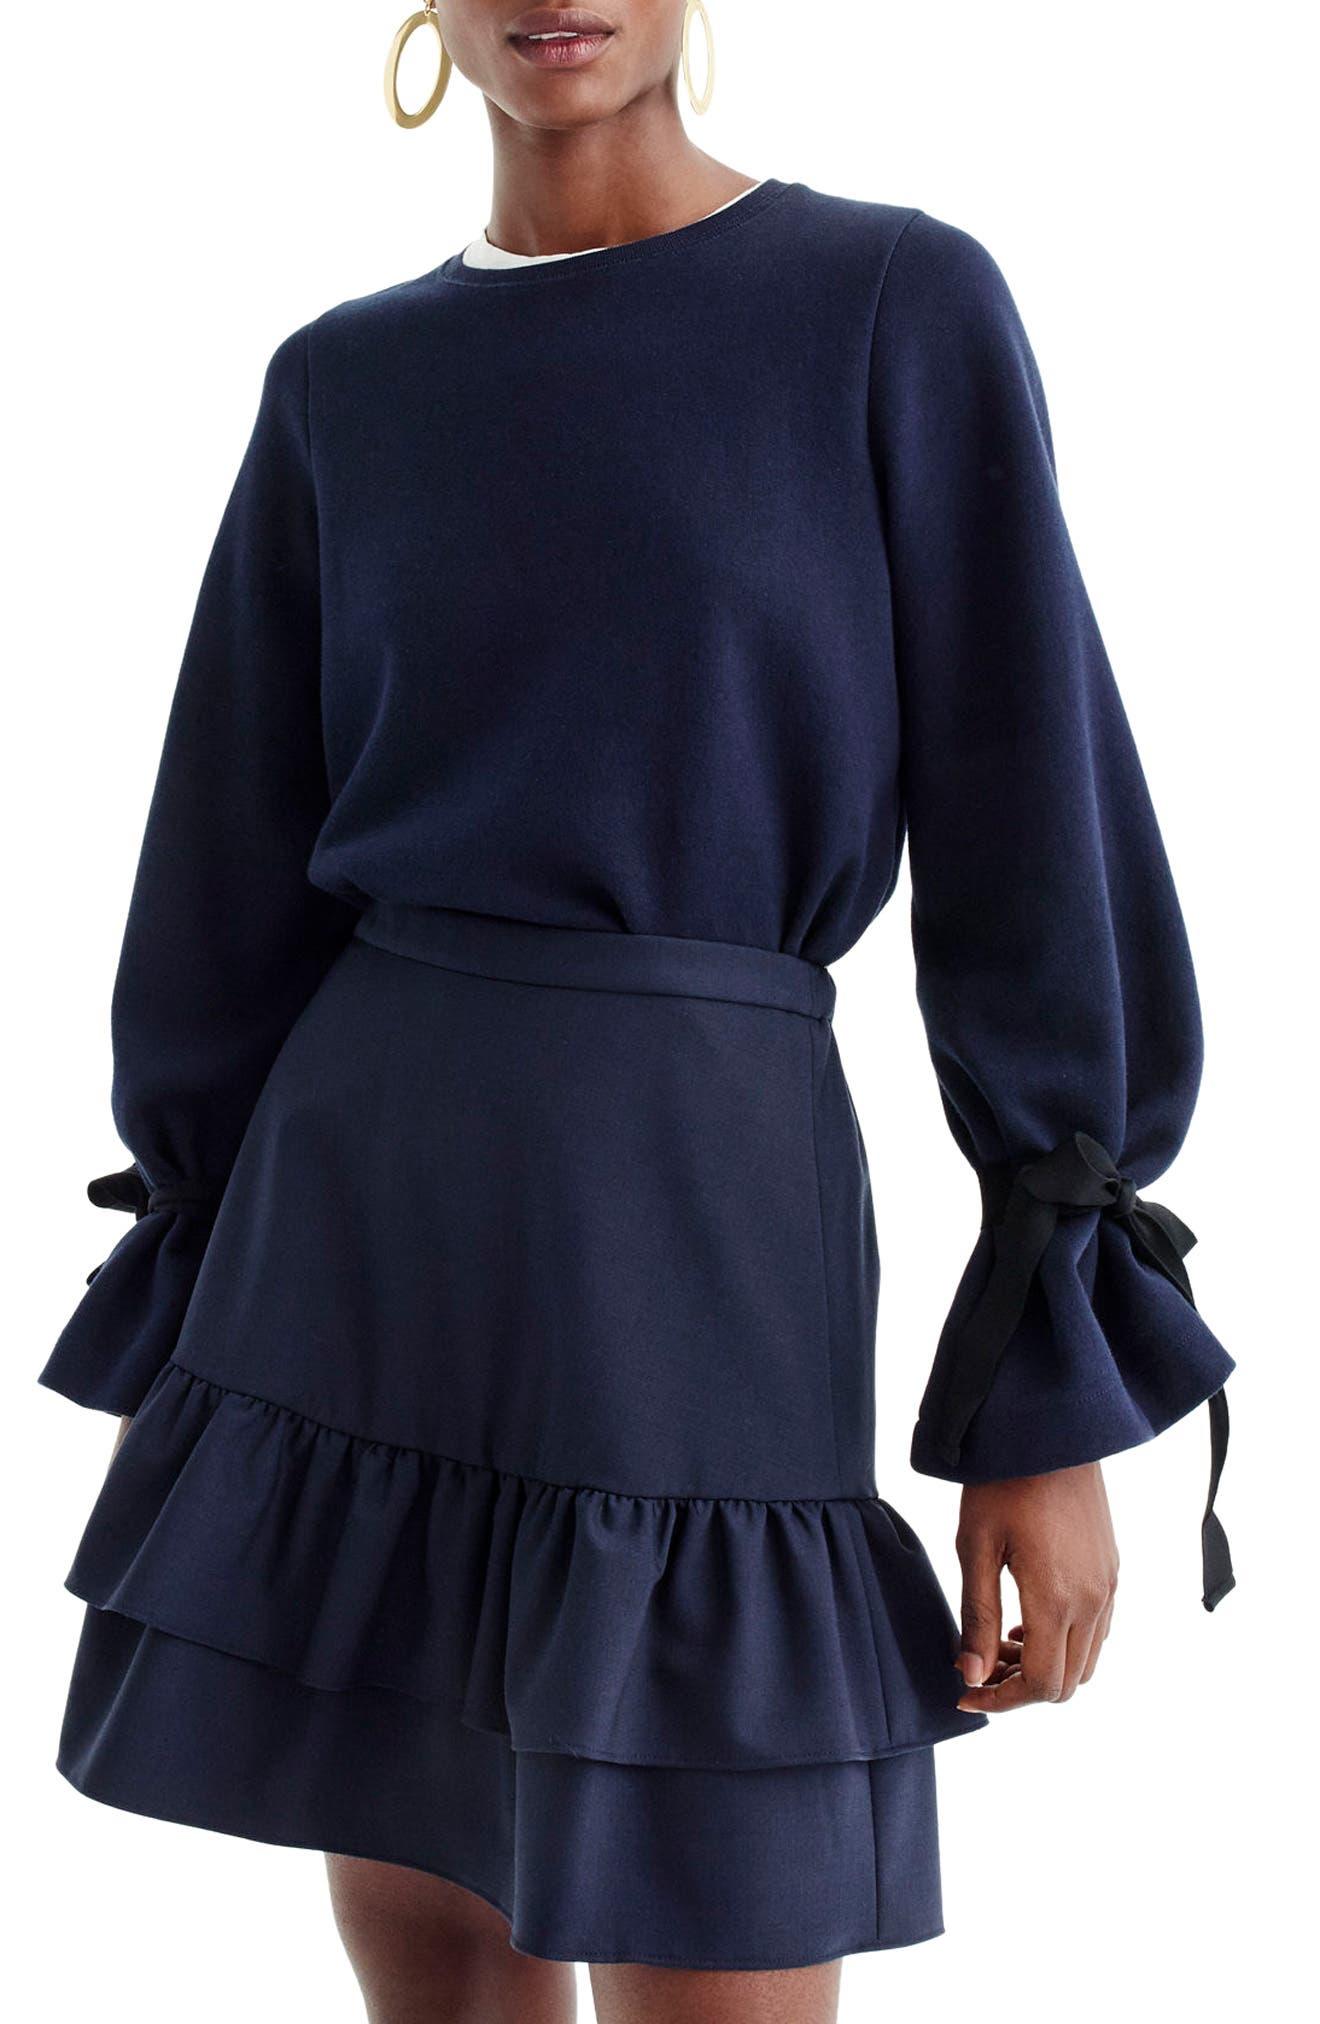 J.Crew Tie Sleeve Sweatshirt,                             Main thumbnail 1, color,                             Navy